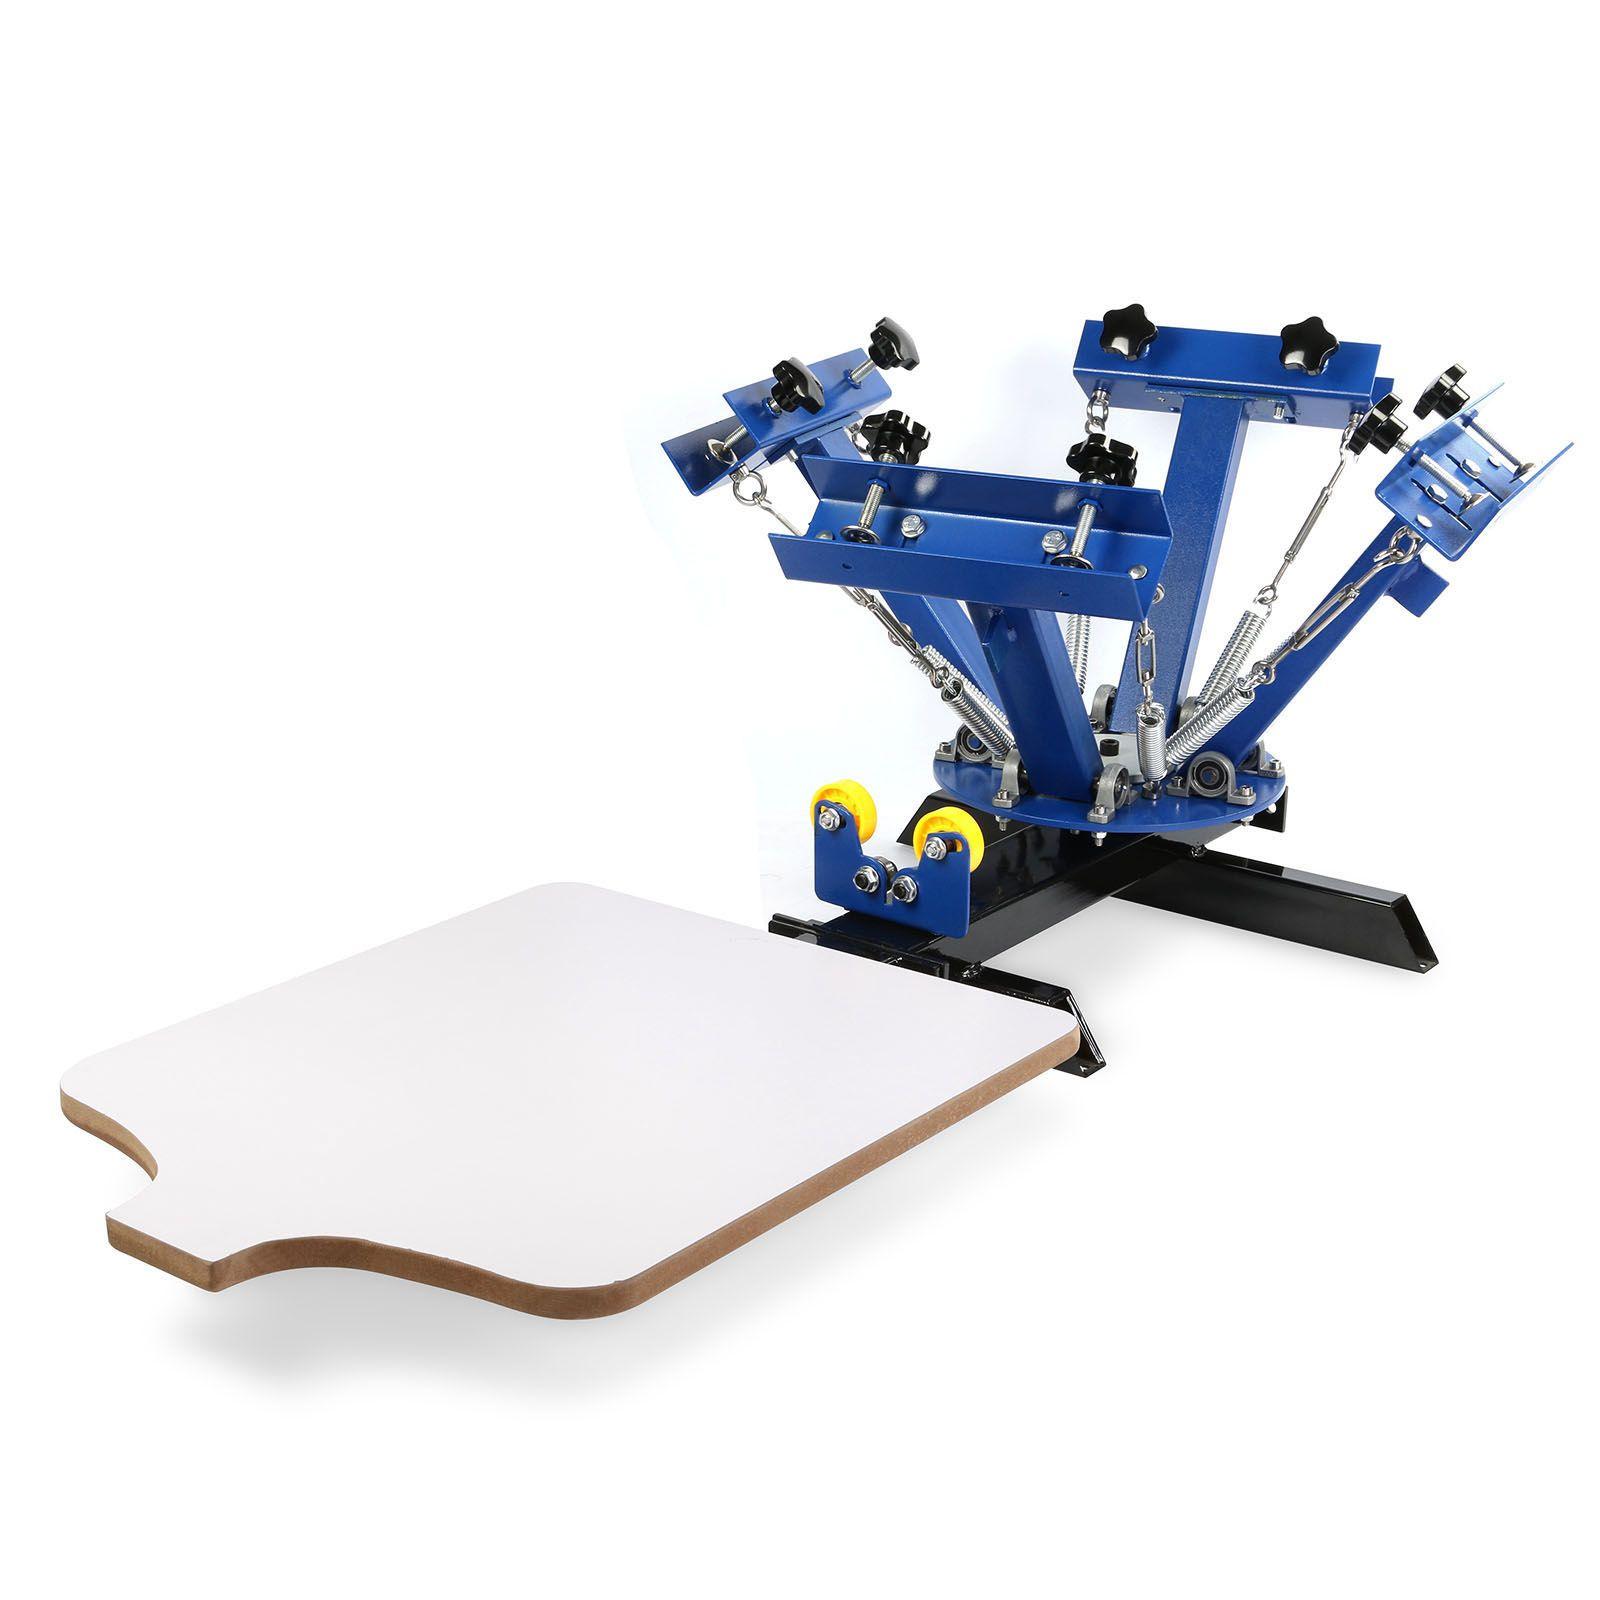 Color press printing - 4 Color 1 Station Silk Screen Printing Machine 4 1 Press Diy T Shirt